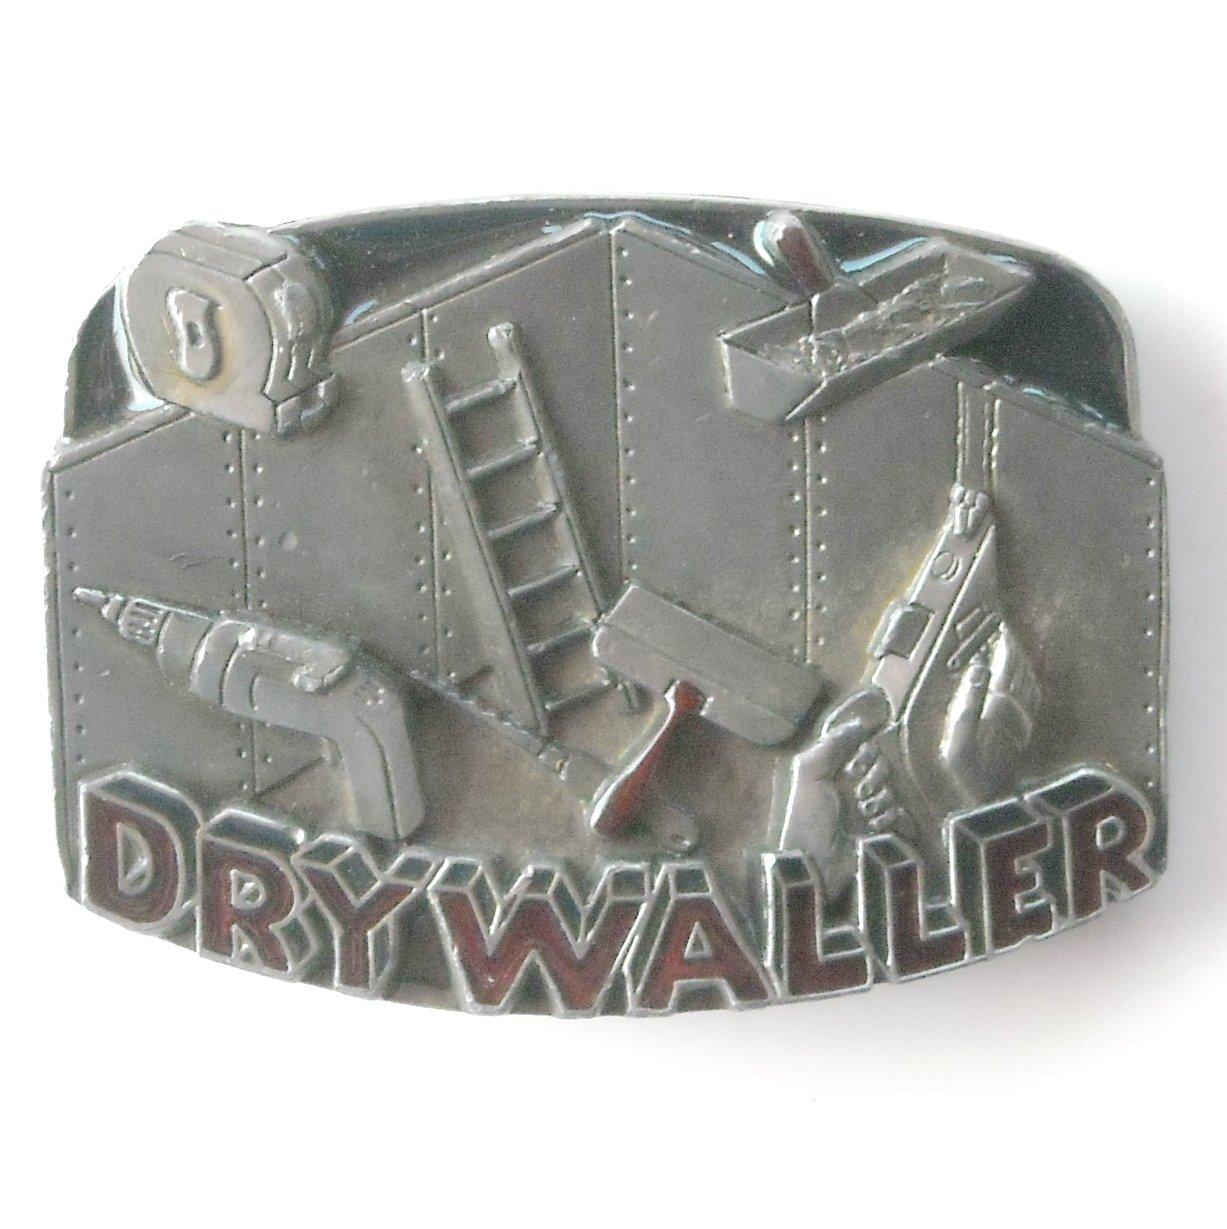 Drywaller 1992 C&J Inc pewter alloy belt buckle